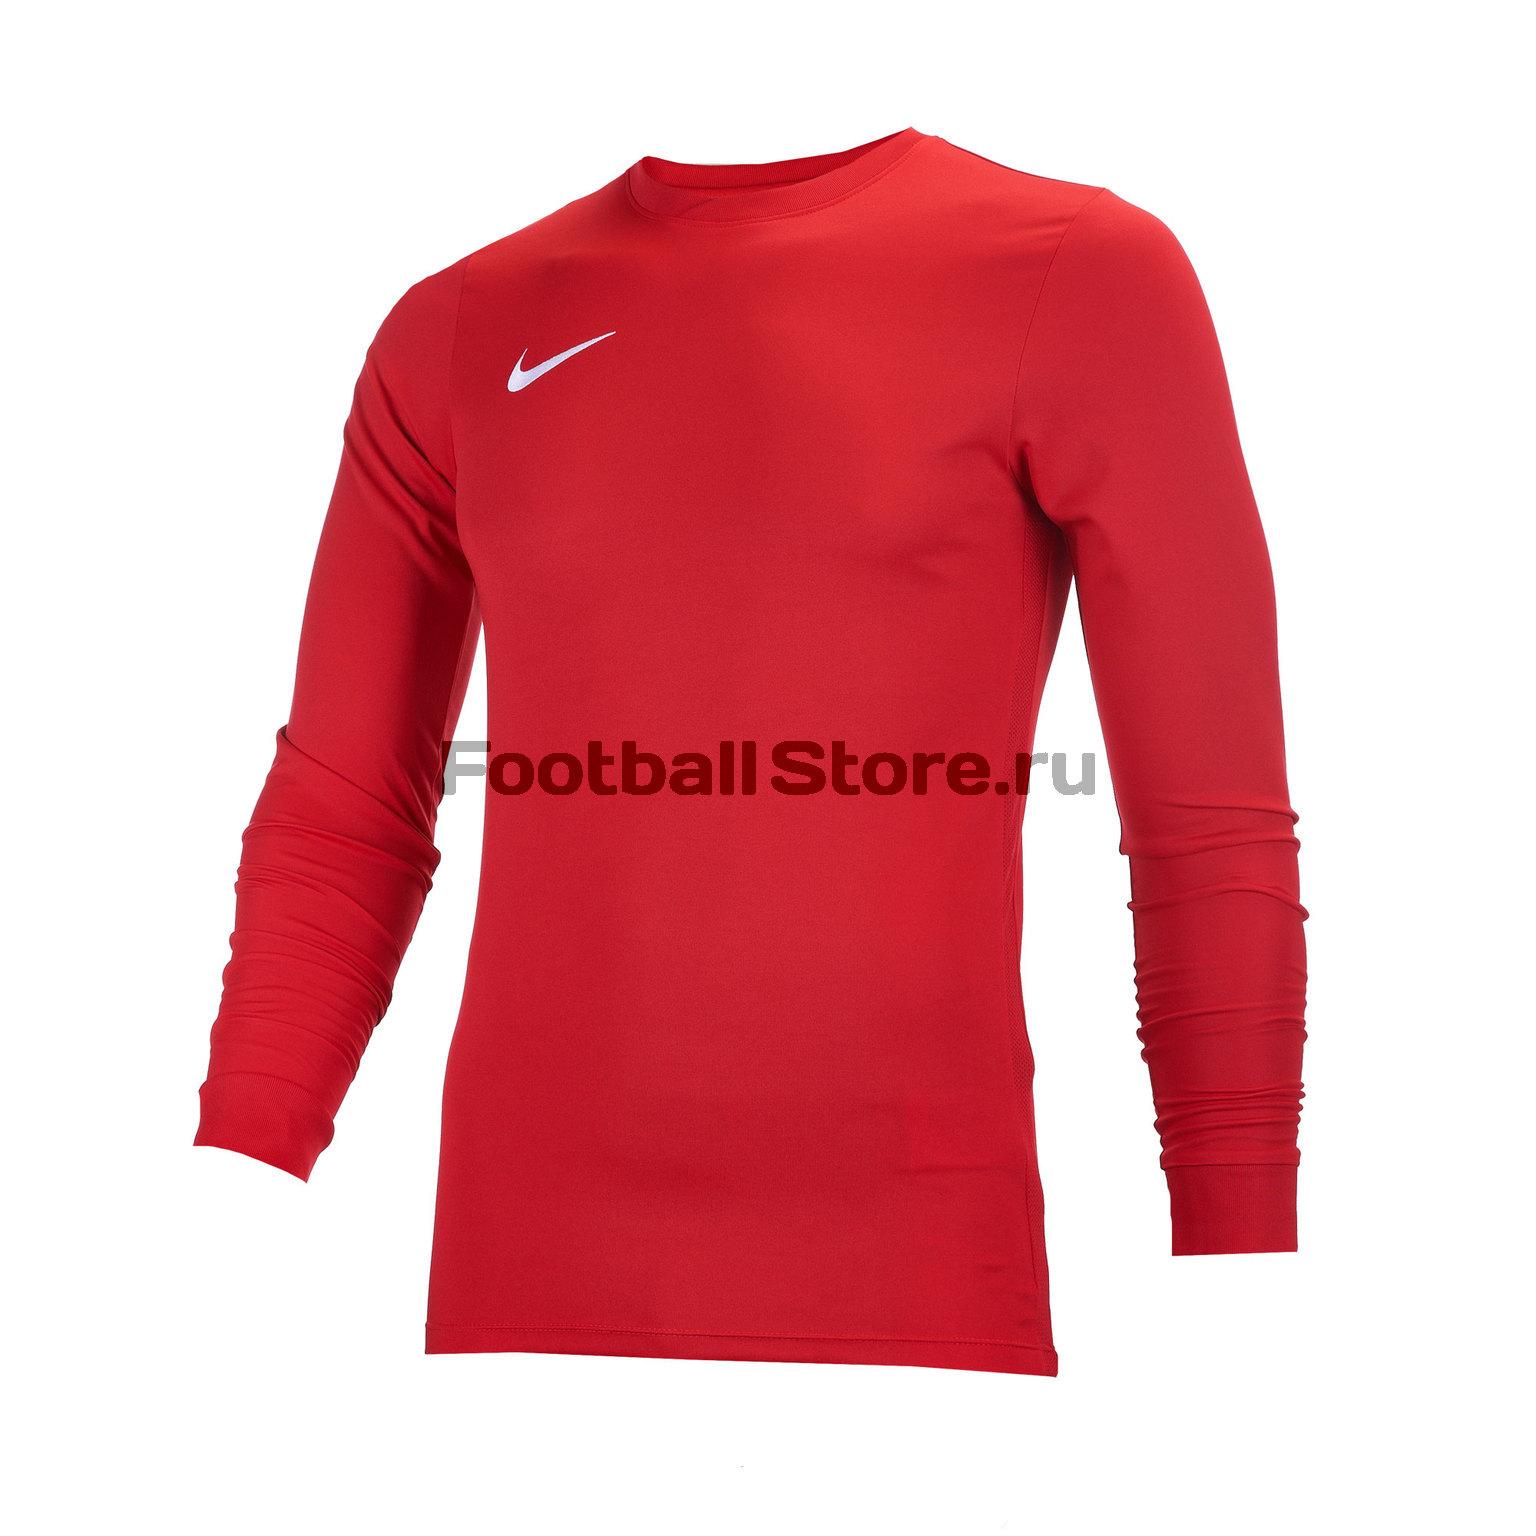 Футболка игровая Nike LS Park VI JSY 725884-657 футболка игровая nike dry tiempo prem jsy ss 894230 057